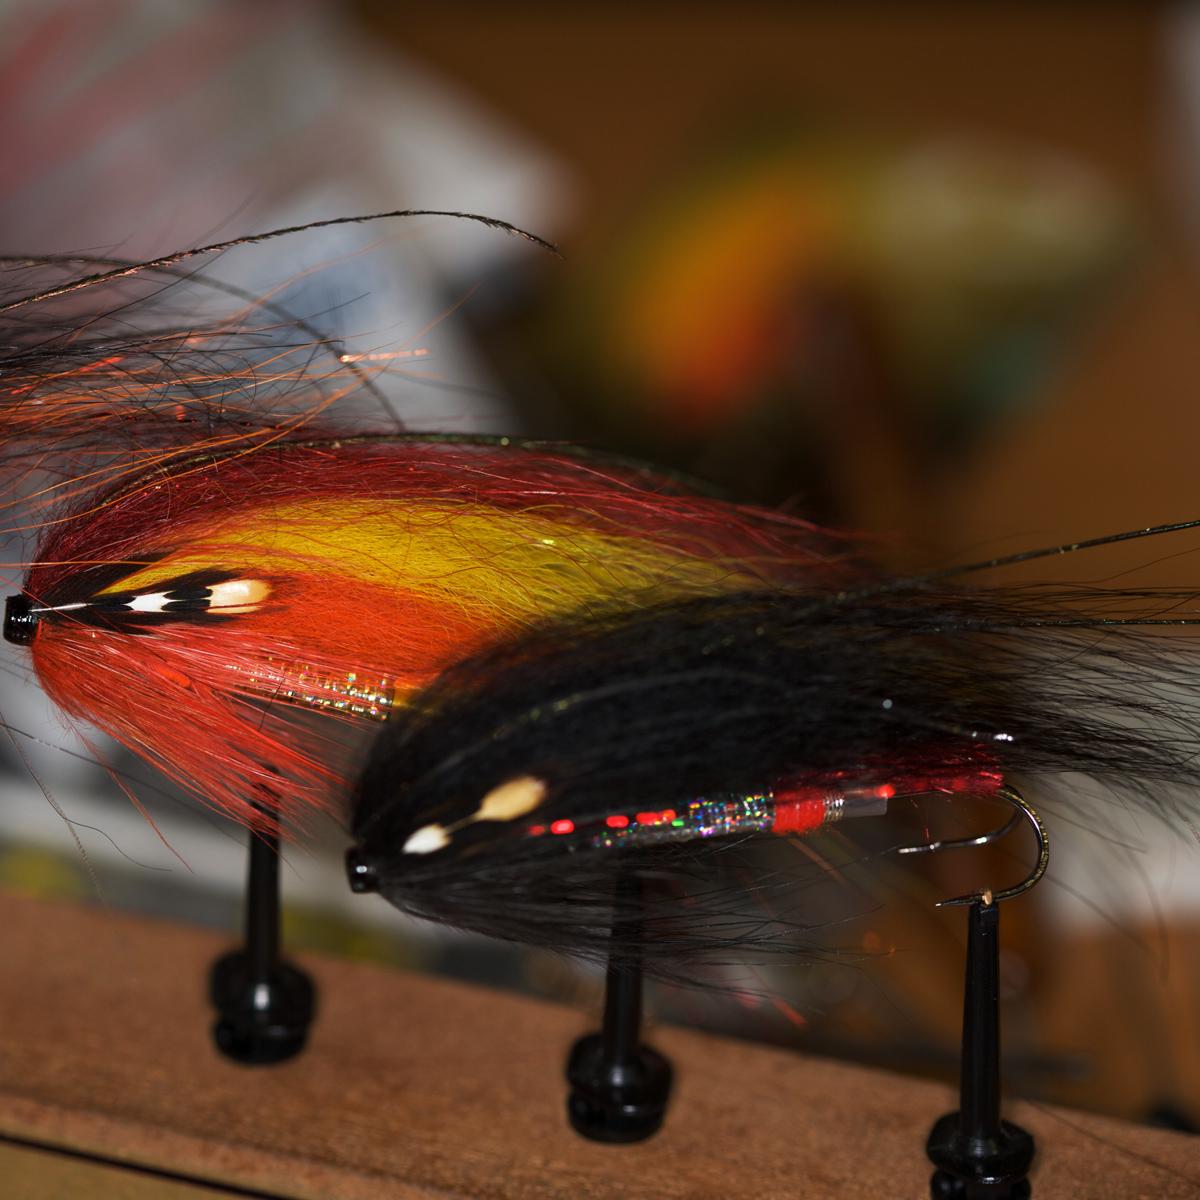 Lachs-Tubenfliegen